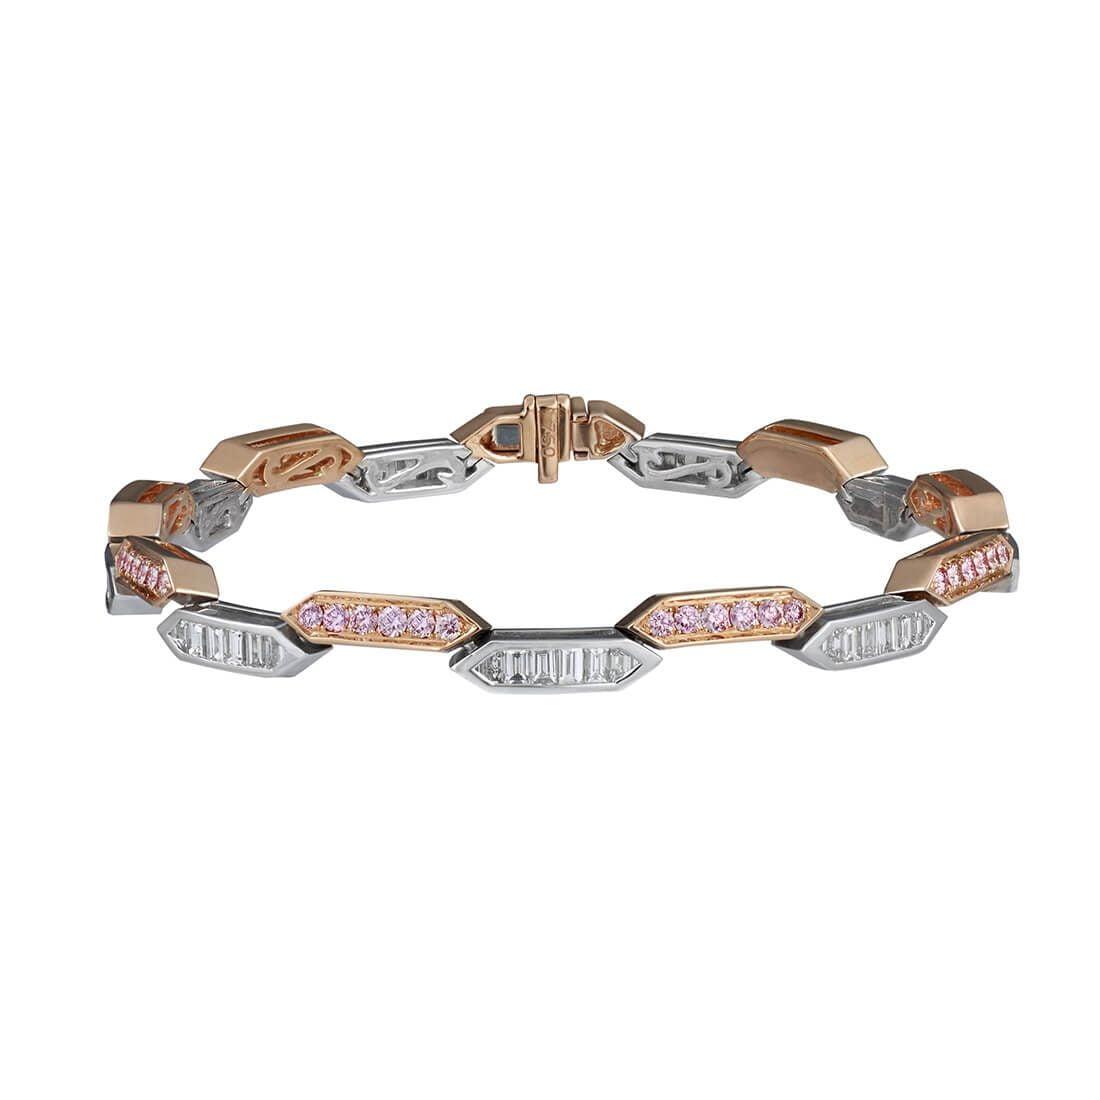 Limited Edition Argyle 'Arm Candy' II Bracelet